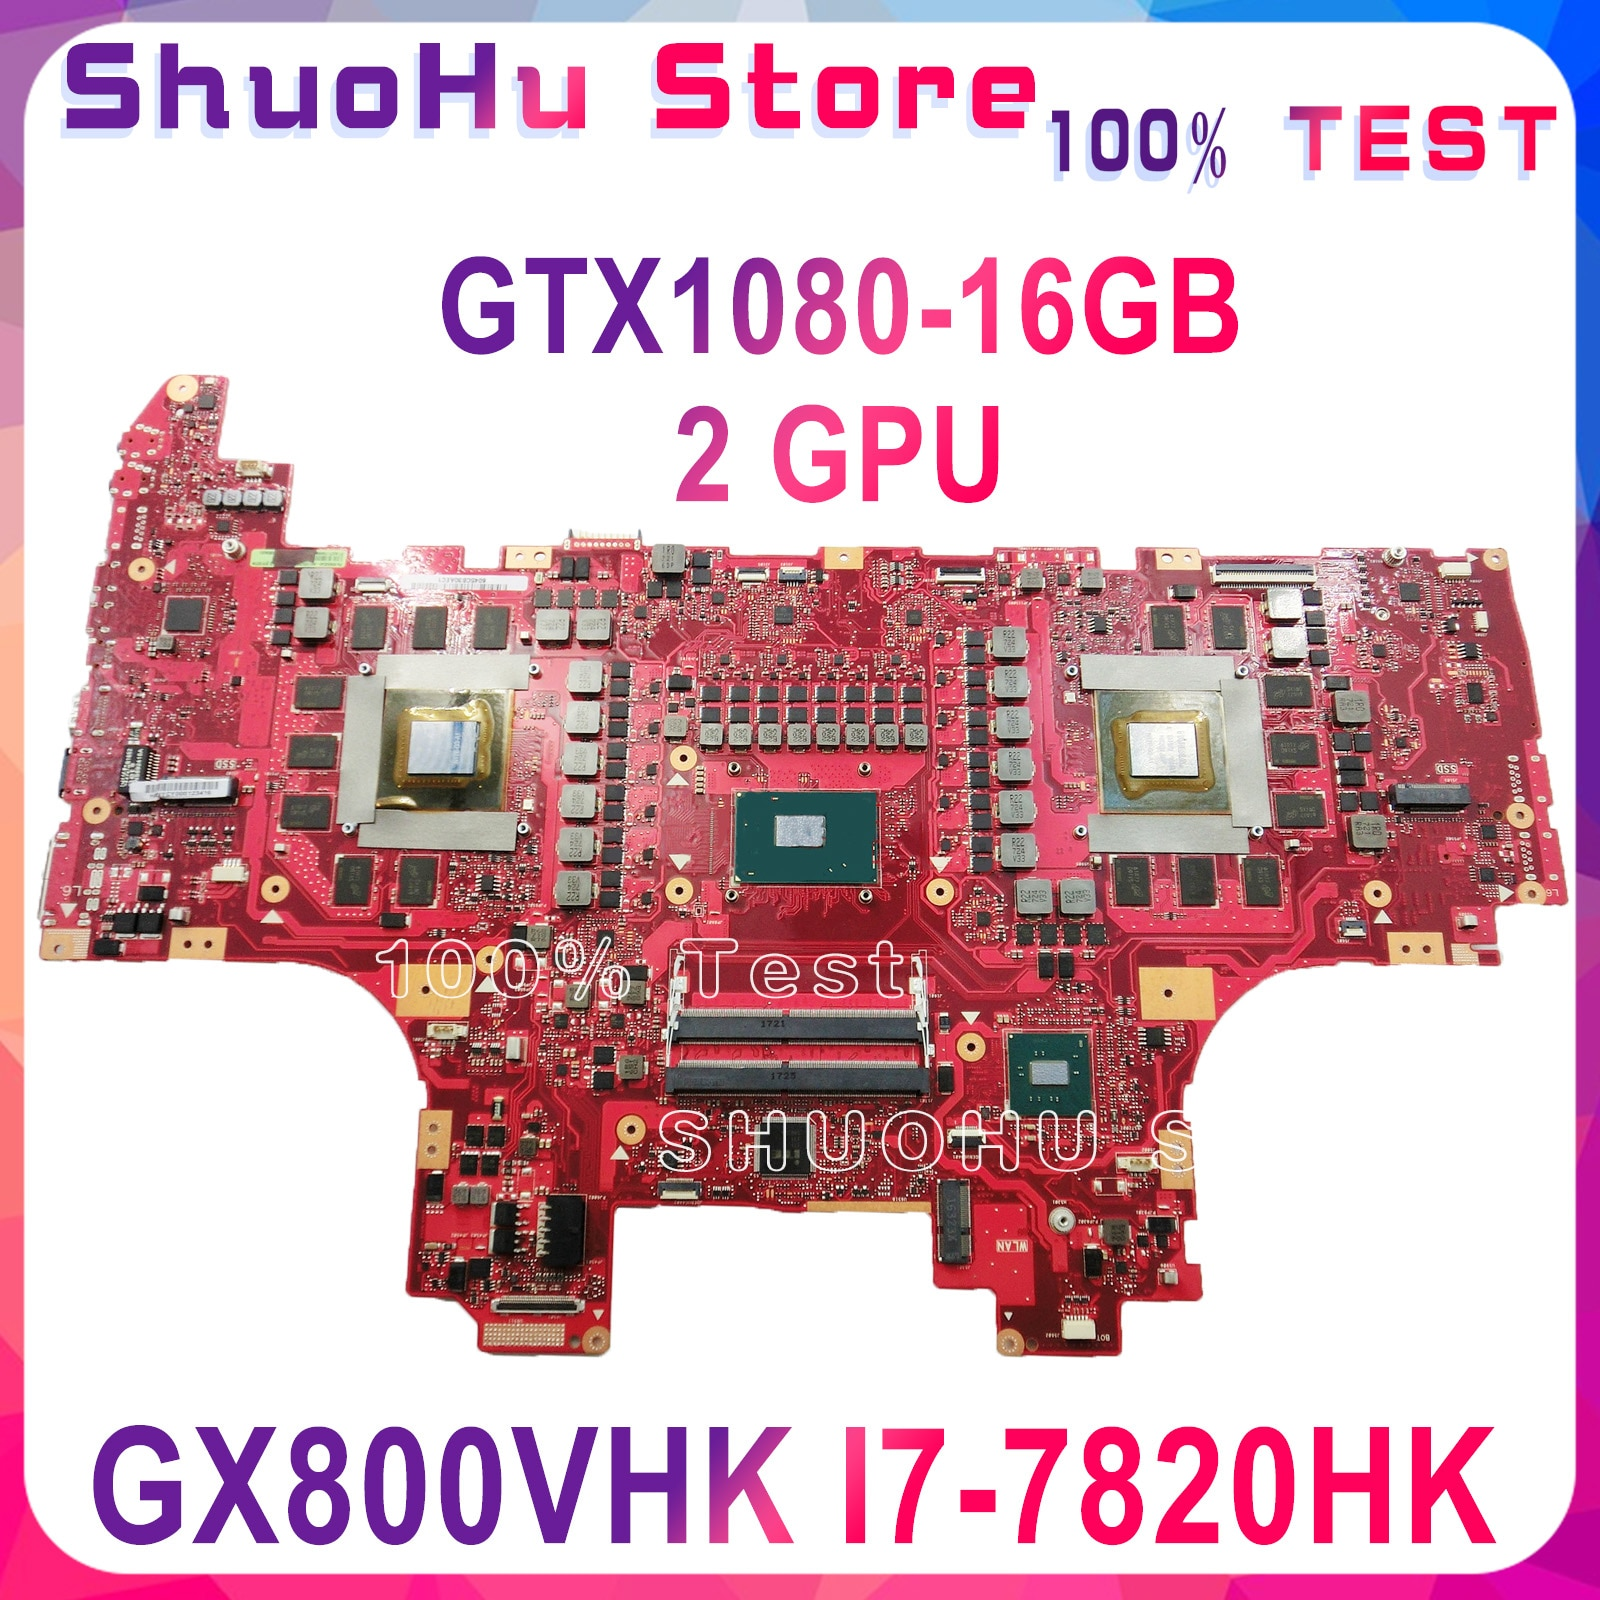 KEFU GX800VHK اللوحة الأم I7-7820HK وحدة المعالجة المركزية GTX1080 16GB بطاقة الفيديو لأسوس ROG GX800 GX800VH GX800VHK اللوحة الرئيسية للكمبيوتر المحمول اختبار 100%